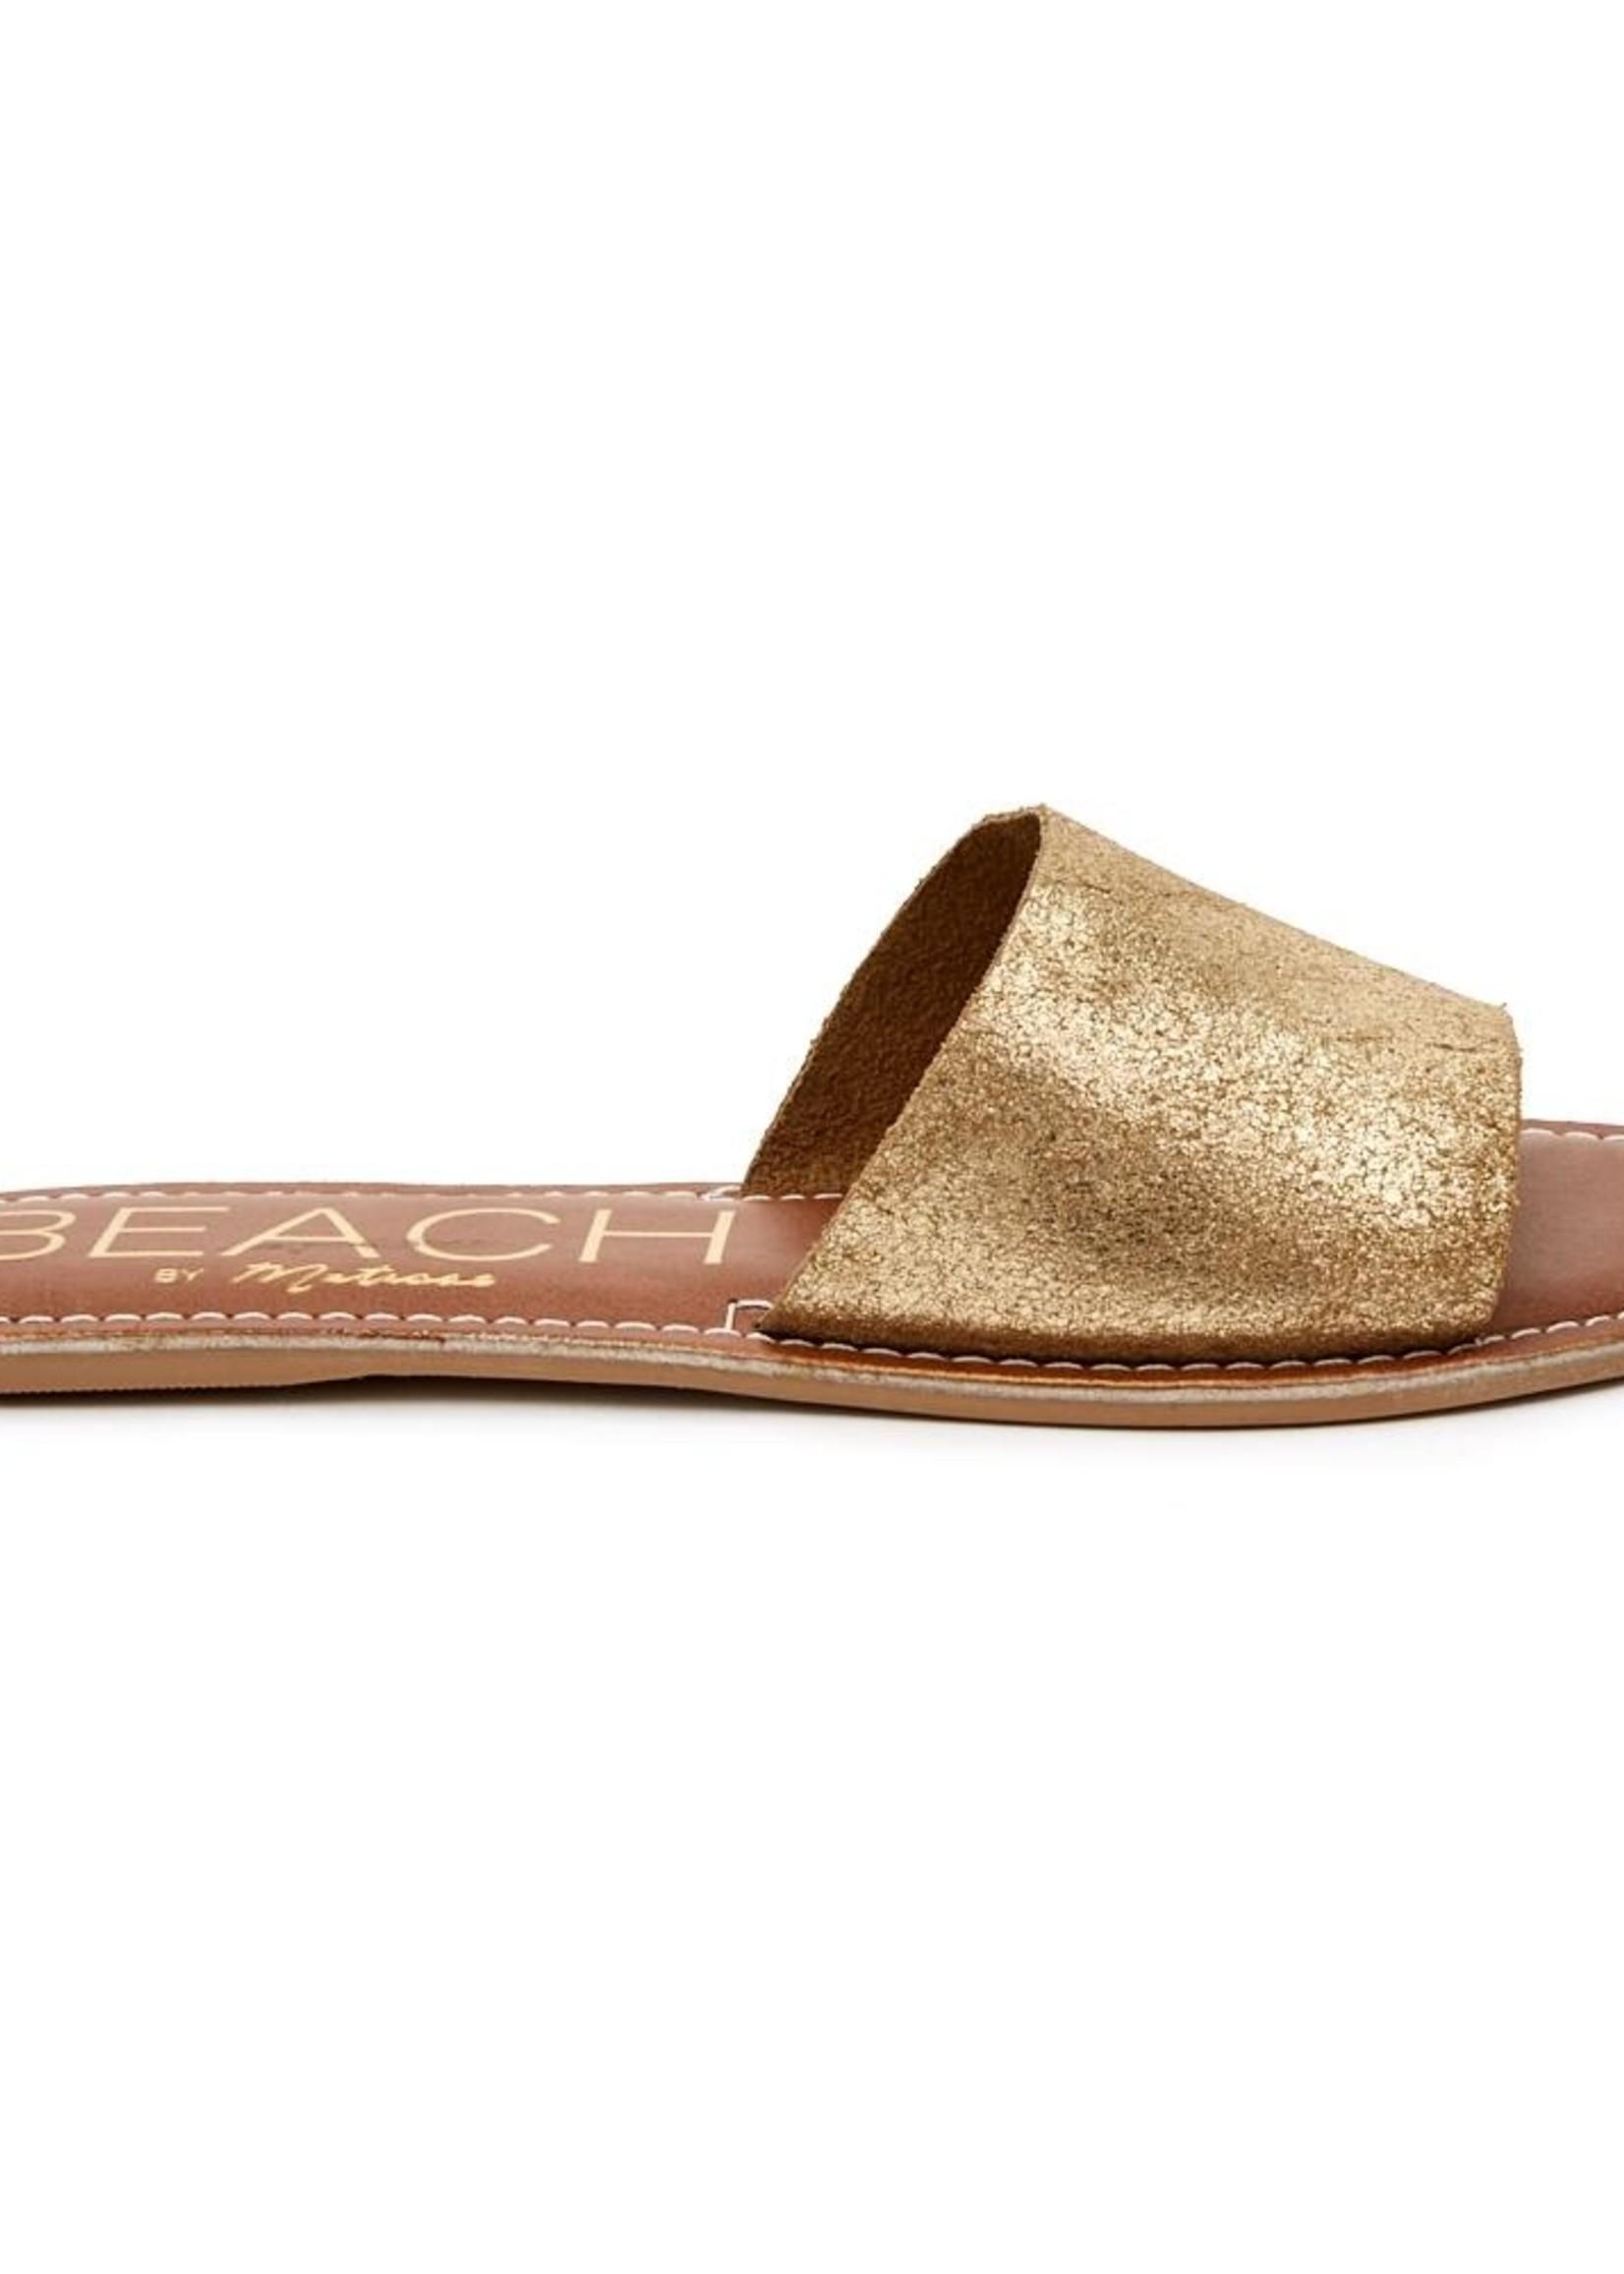 Matisse Cabana Slide in Gold Frost